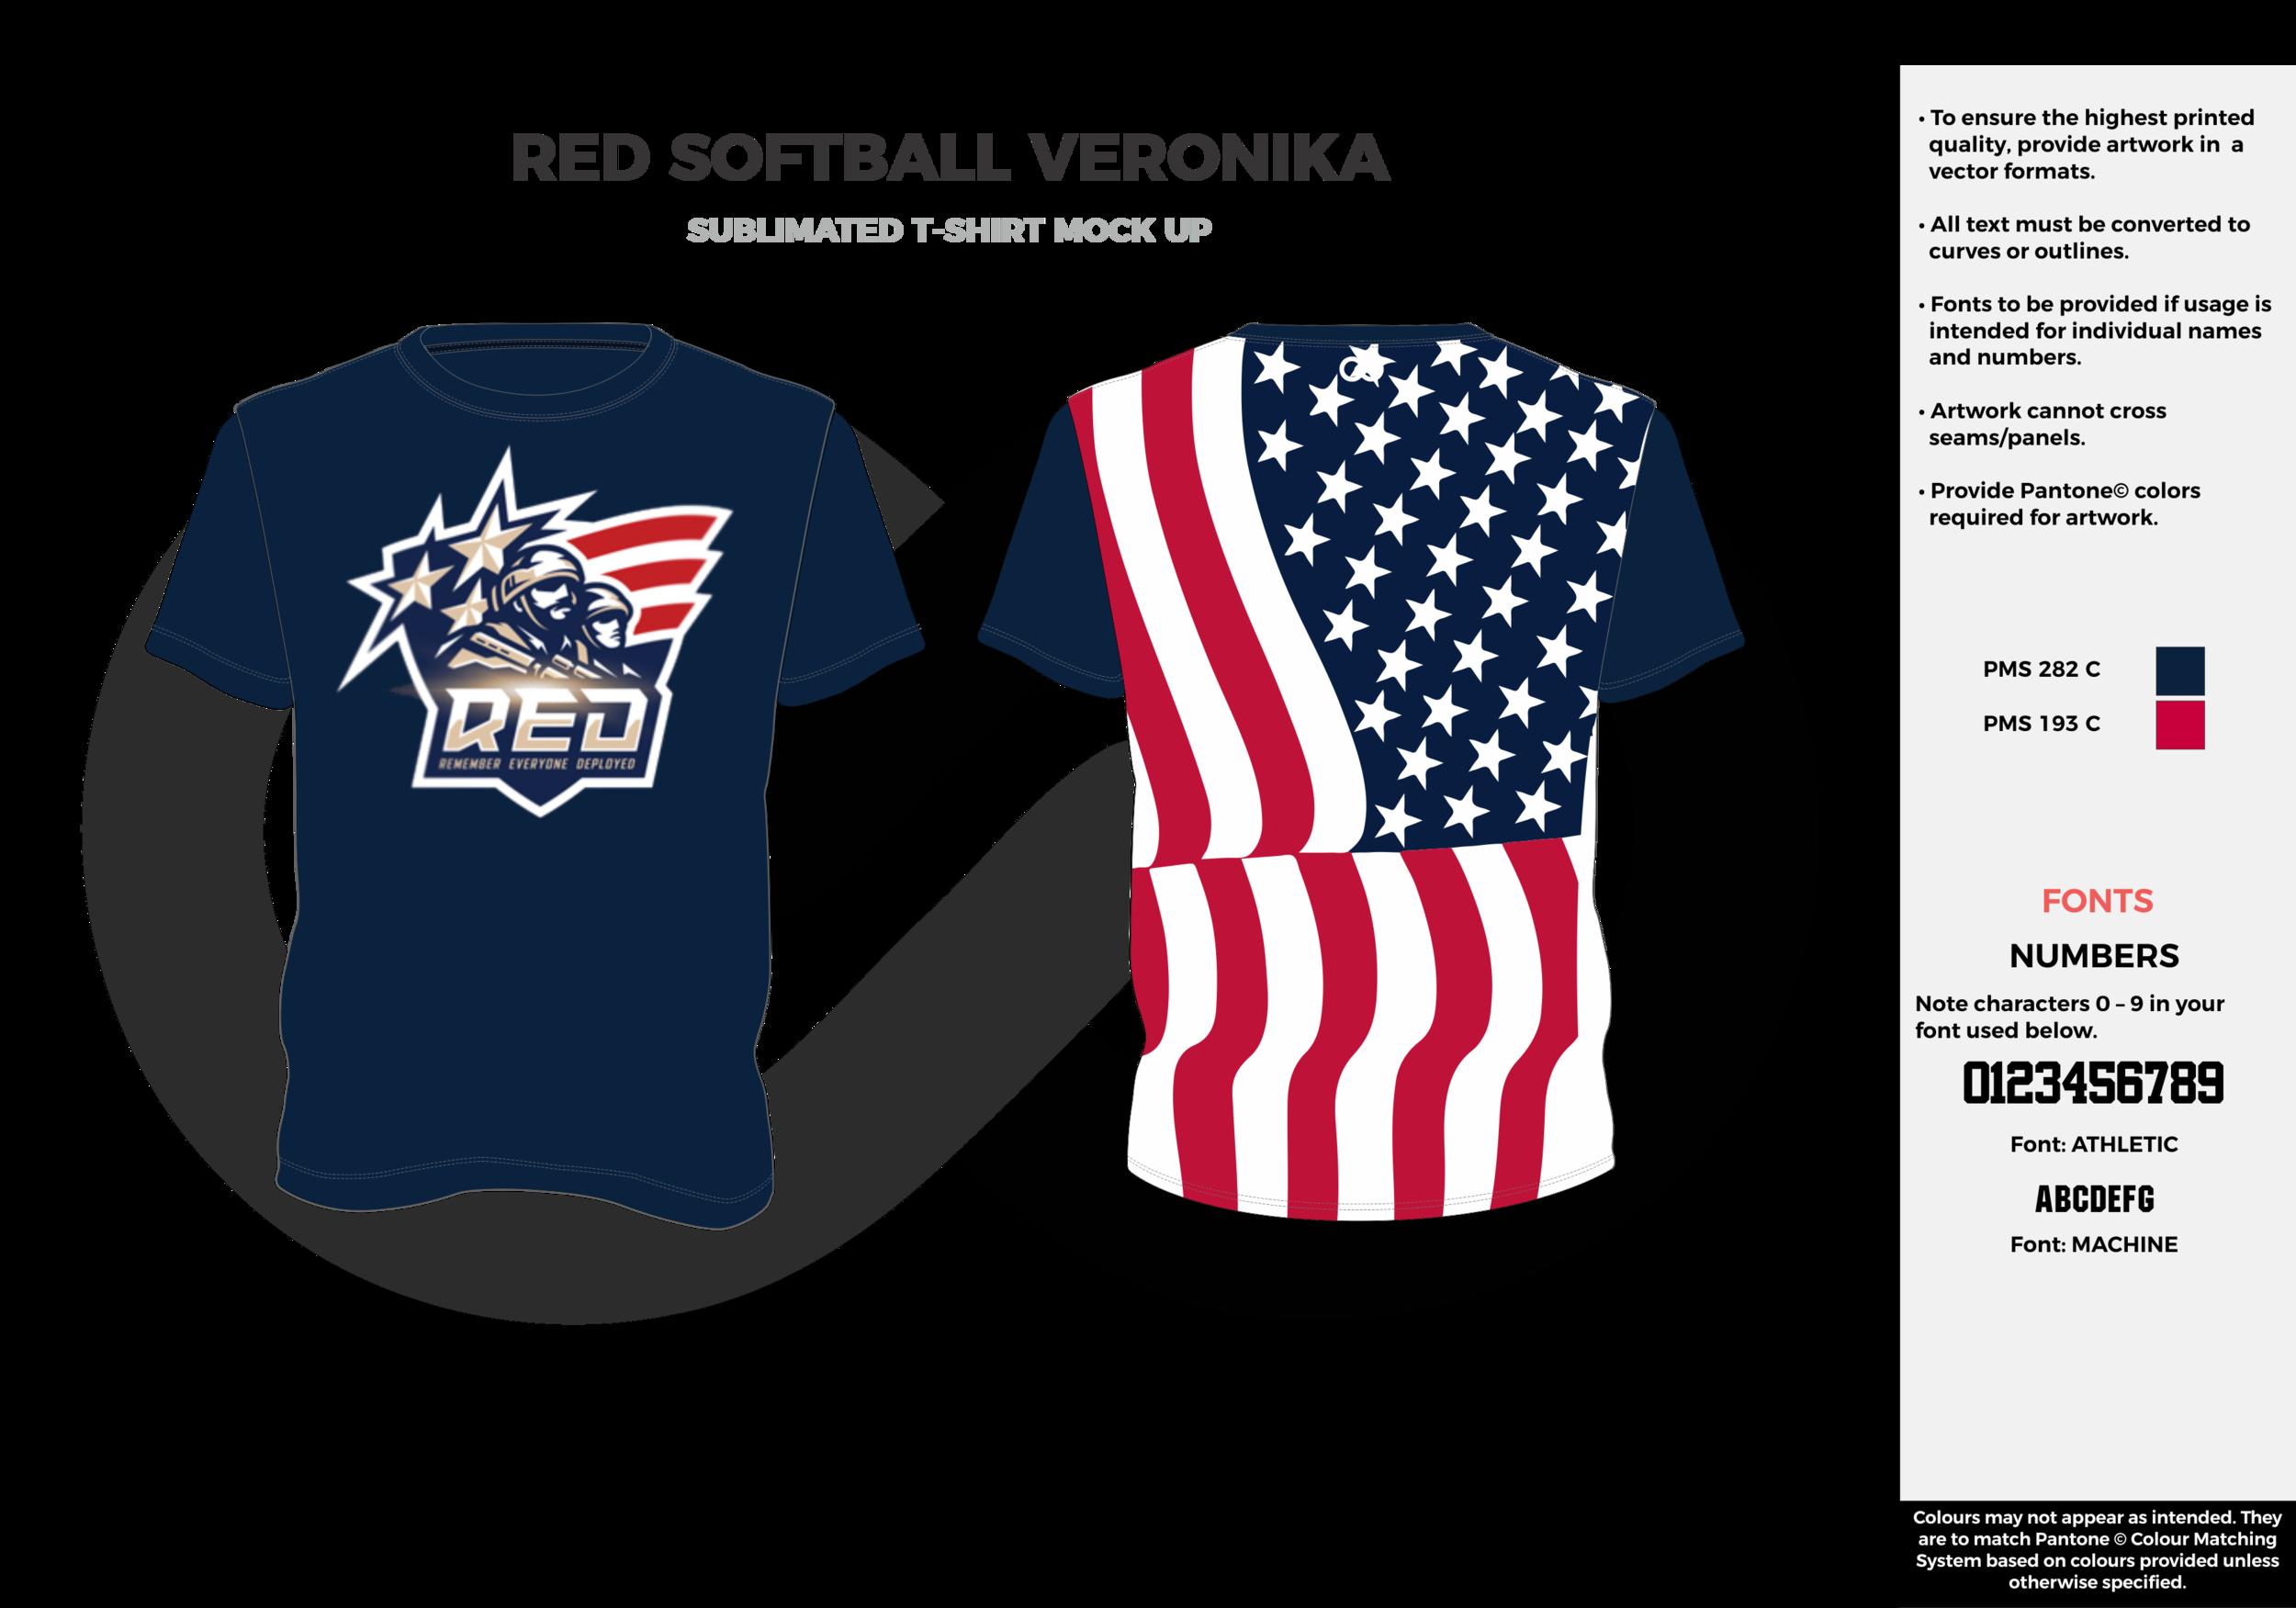 RED SOFTBALL VERONIKA navy blue red white custom design t-shirts